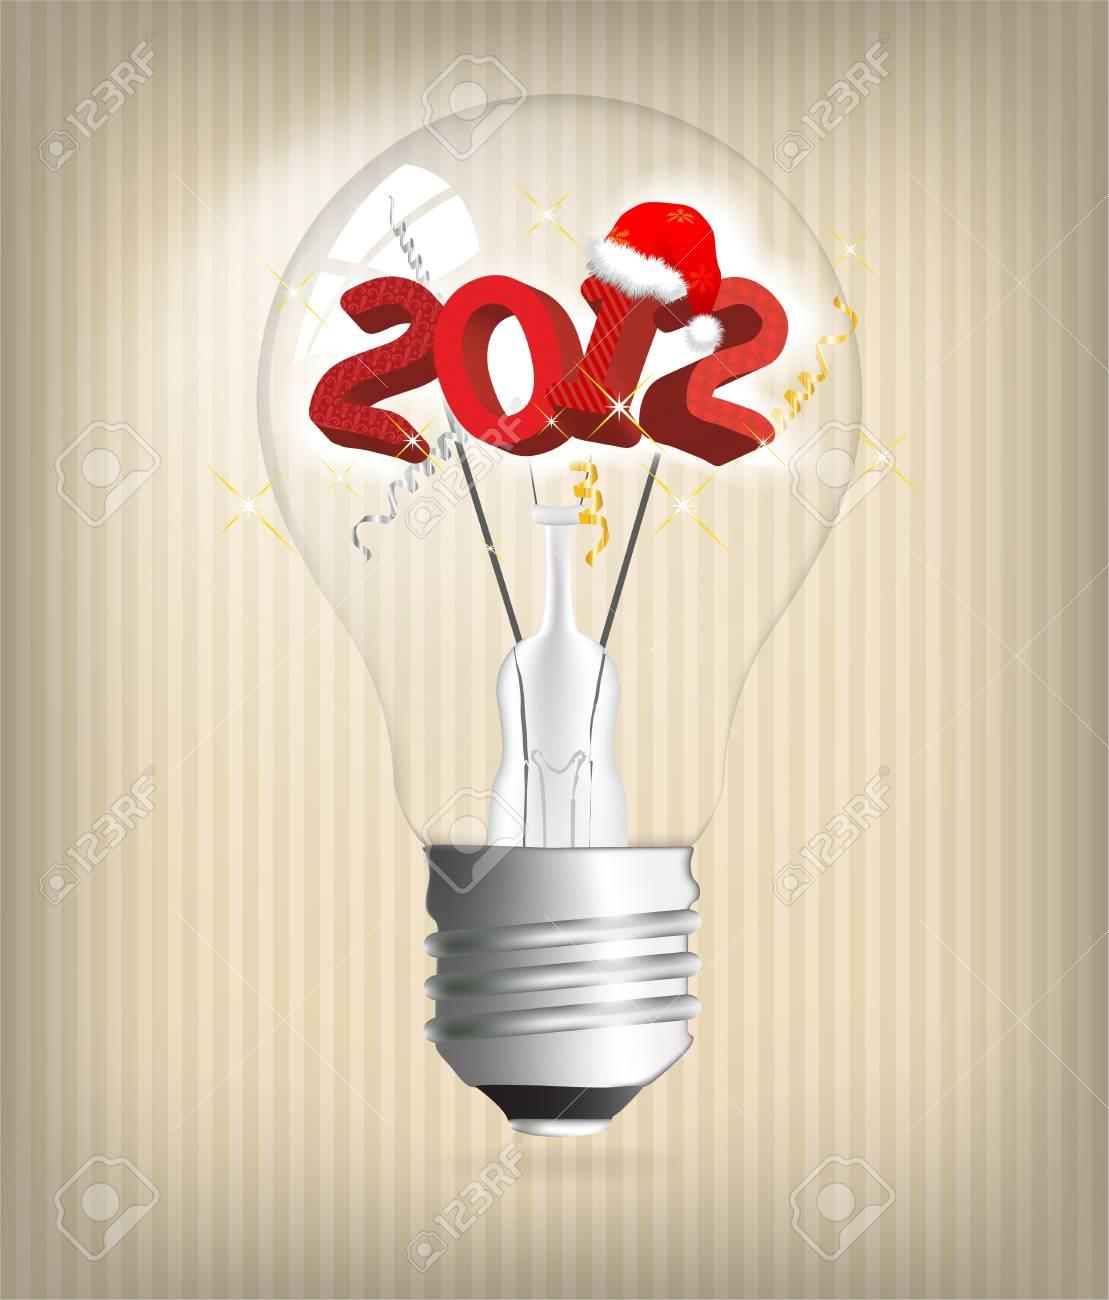 2012 year holiday illustration Stock Vector - 11511685